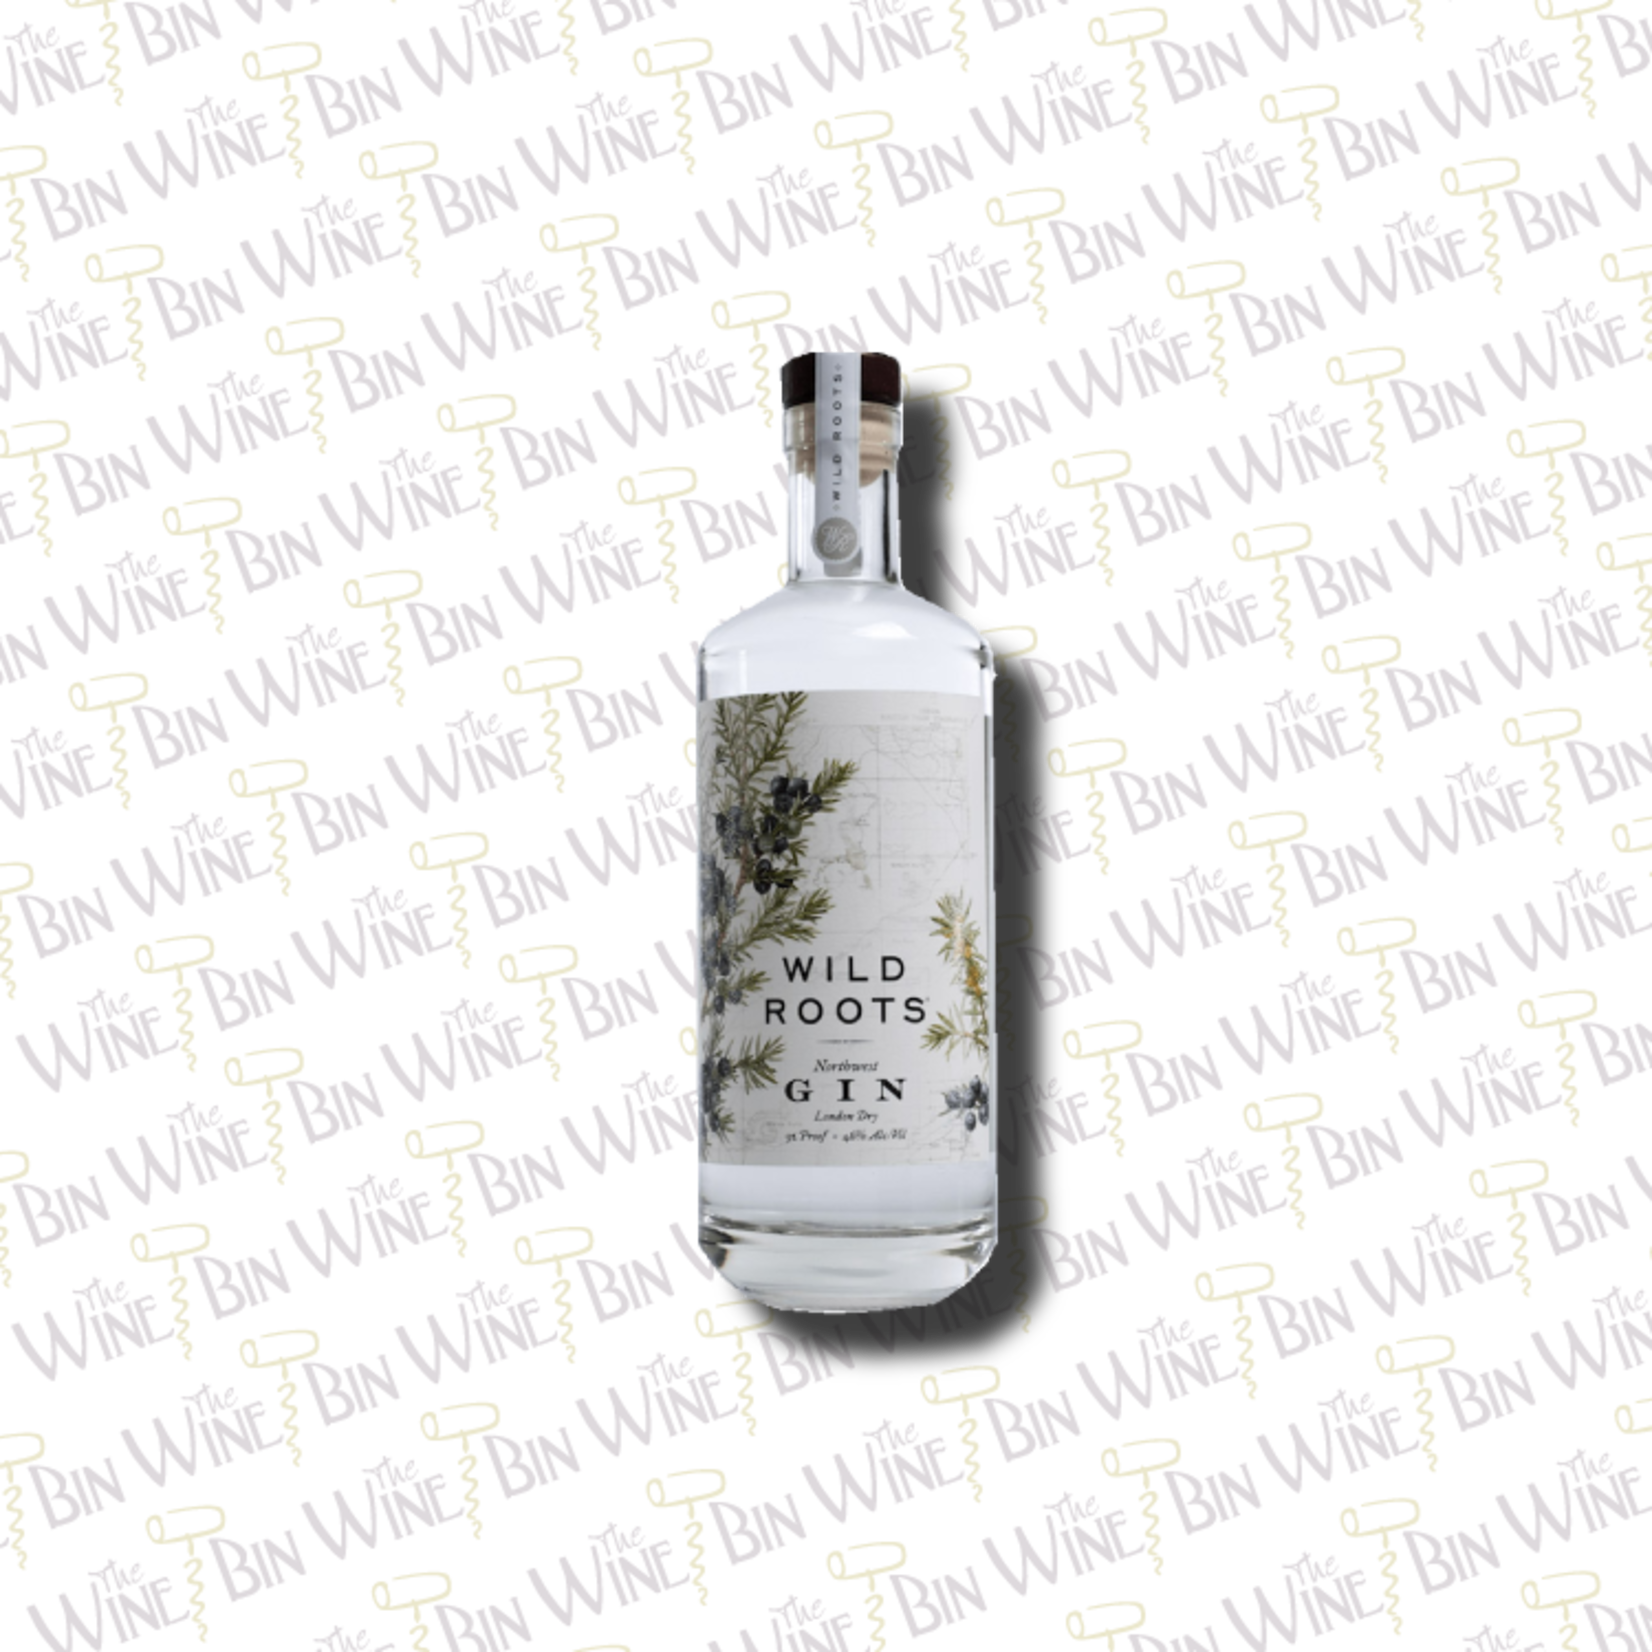 Wild Roots Wild Roots Gin – Plain - 750ml